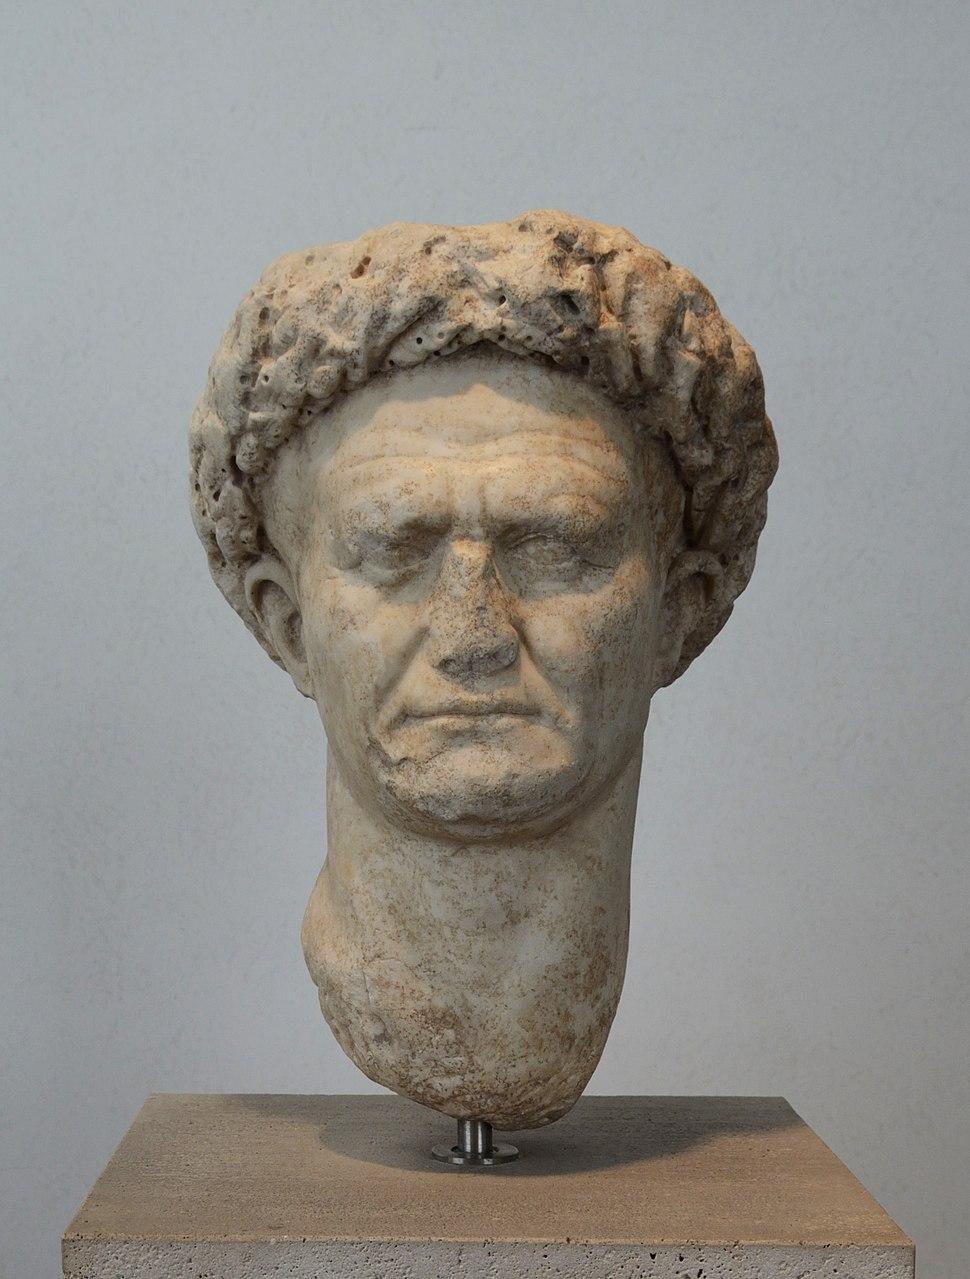 Head of Vespasianus in Palazzo Massimo (Rome)